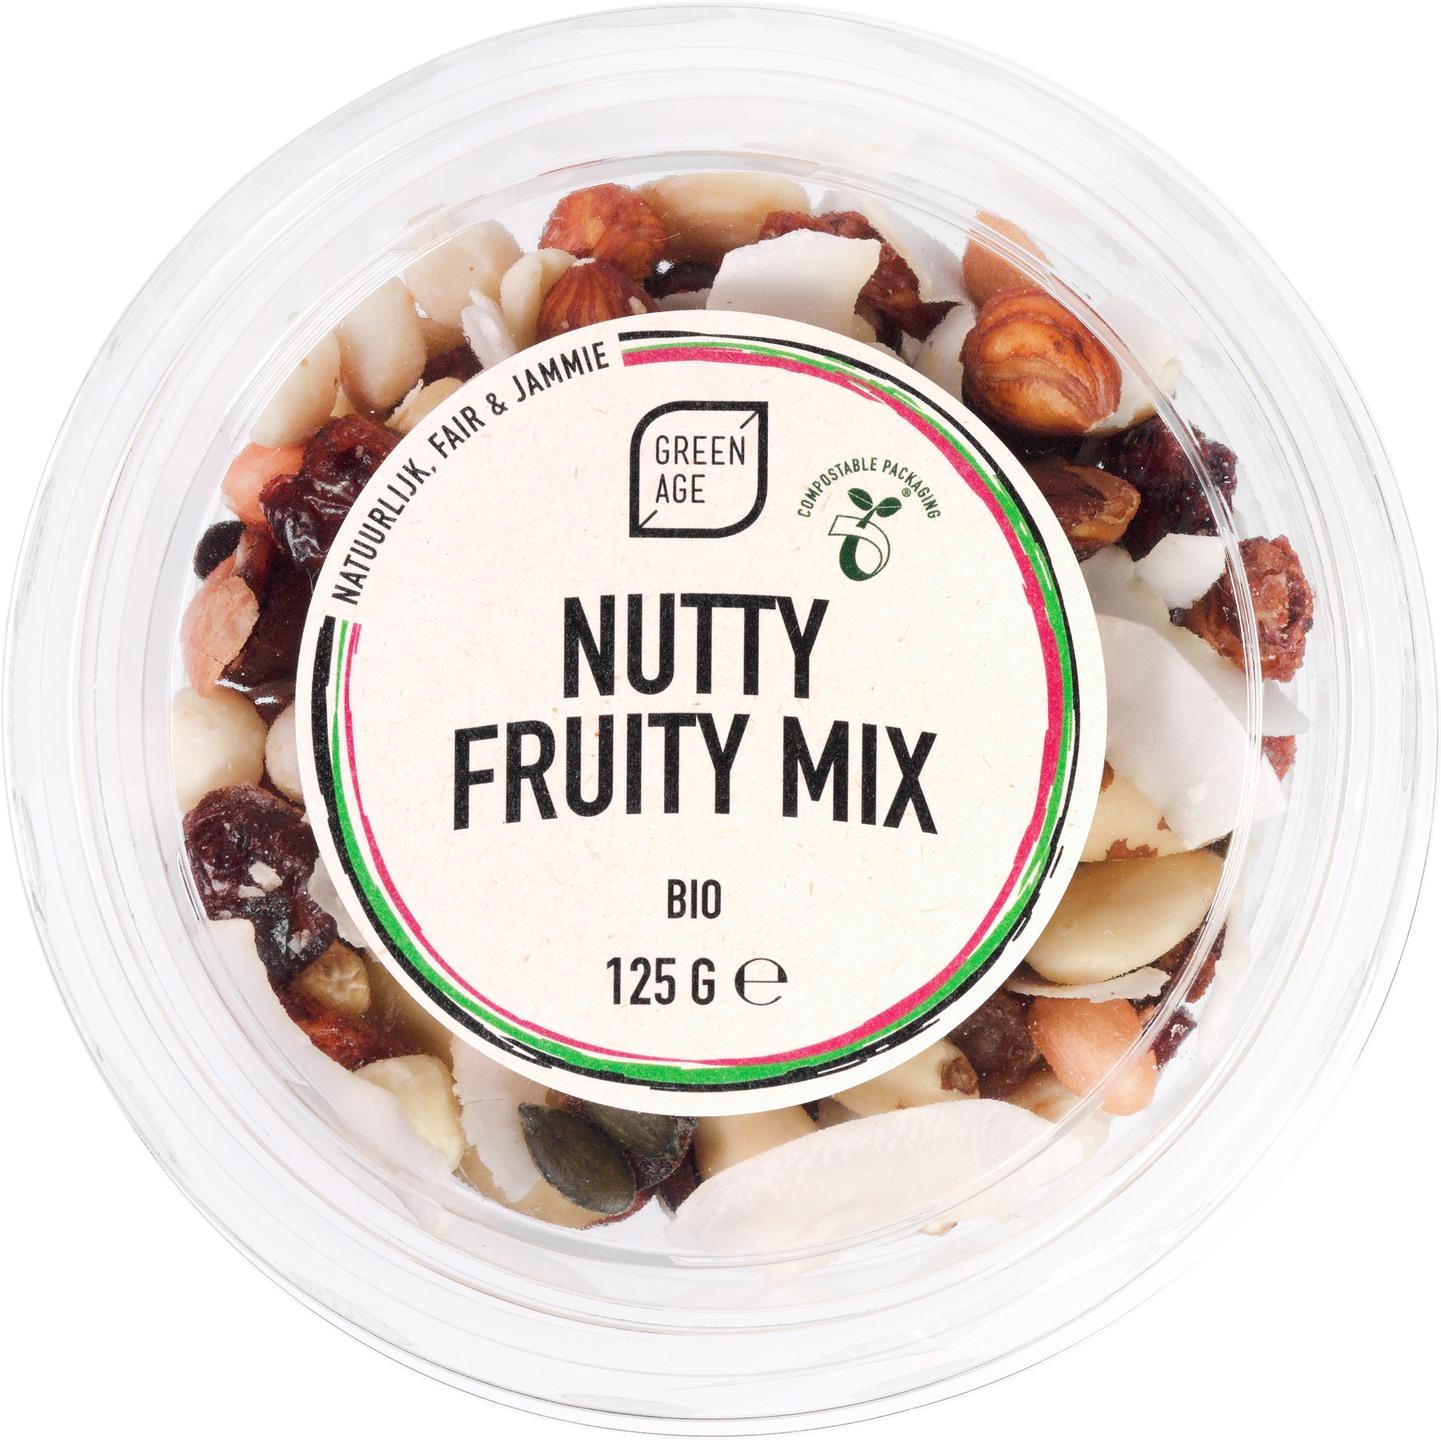 Biologische GreenAge Nutty fruity mix 125 gr